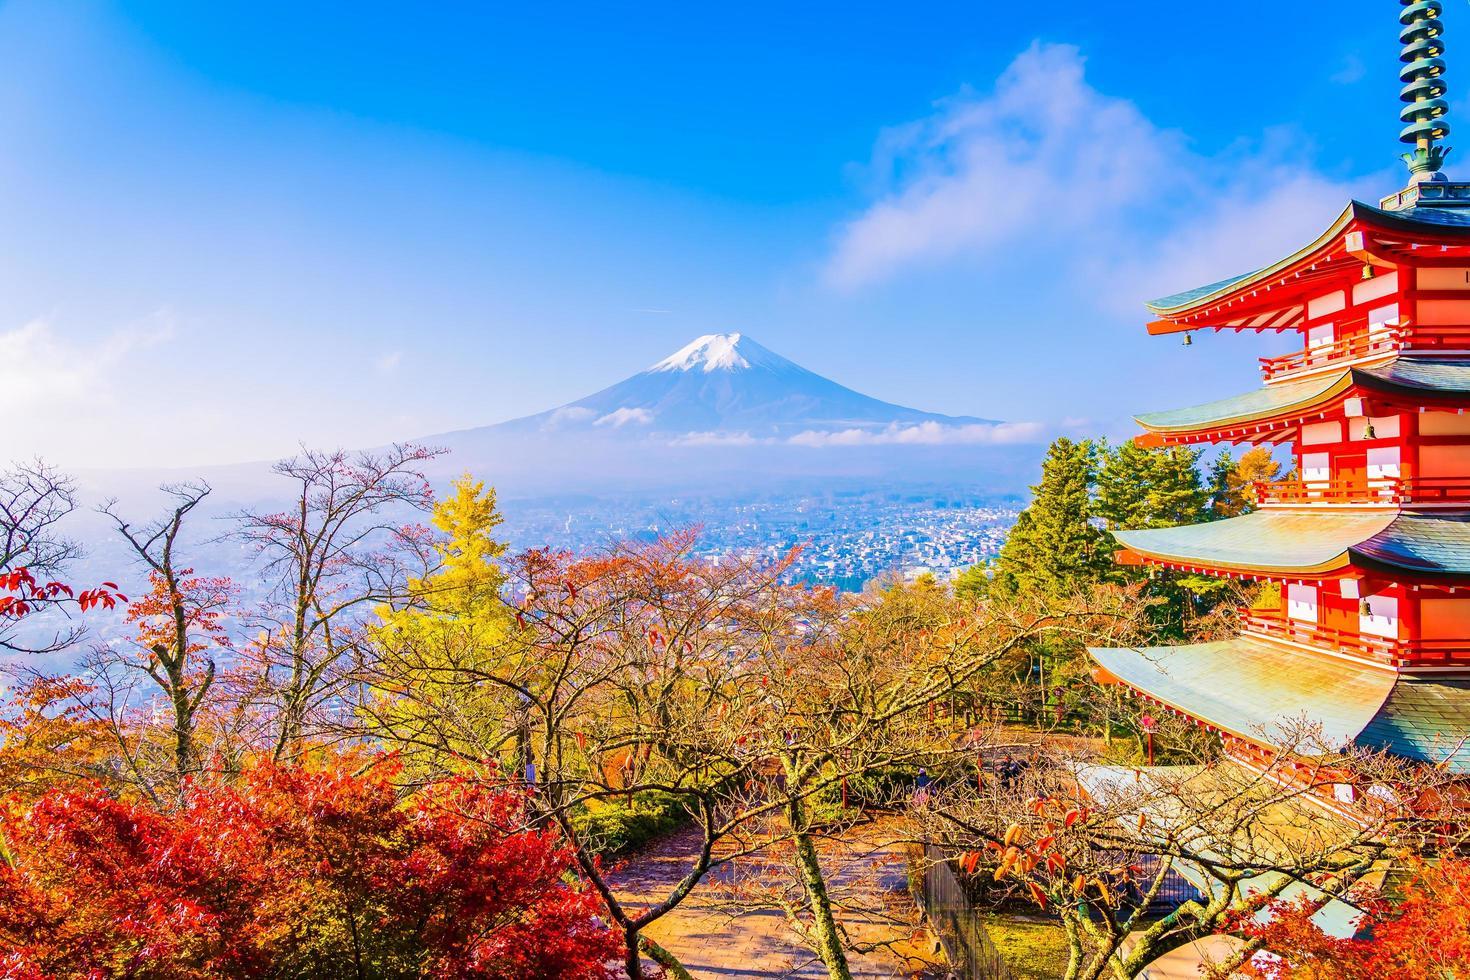 Beautiful landscape of Mt. Fuji with Chureito Pagoda, Japan photo